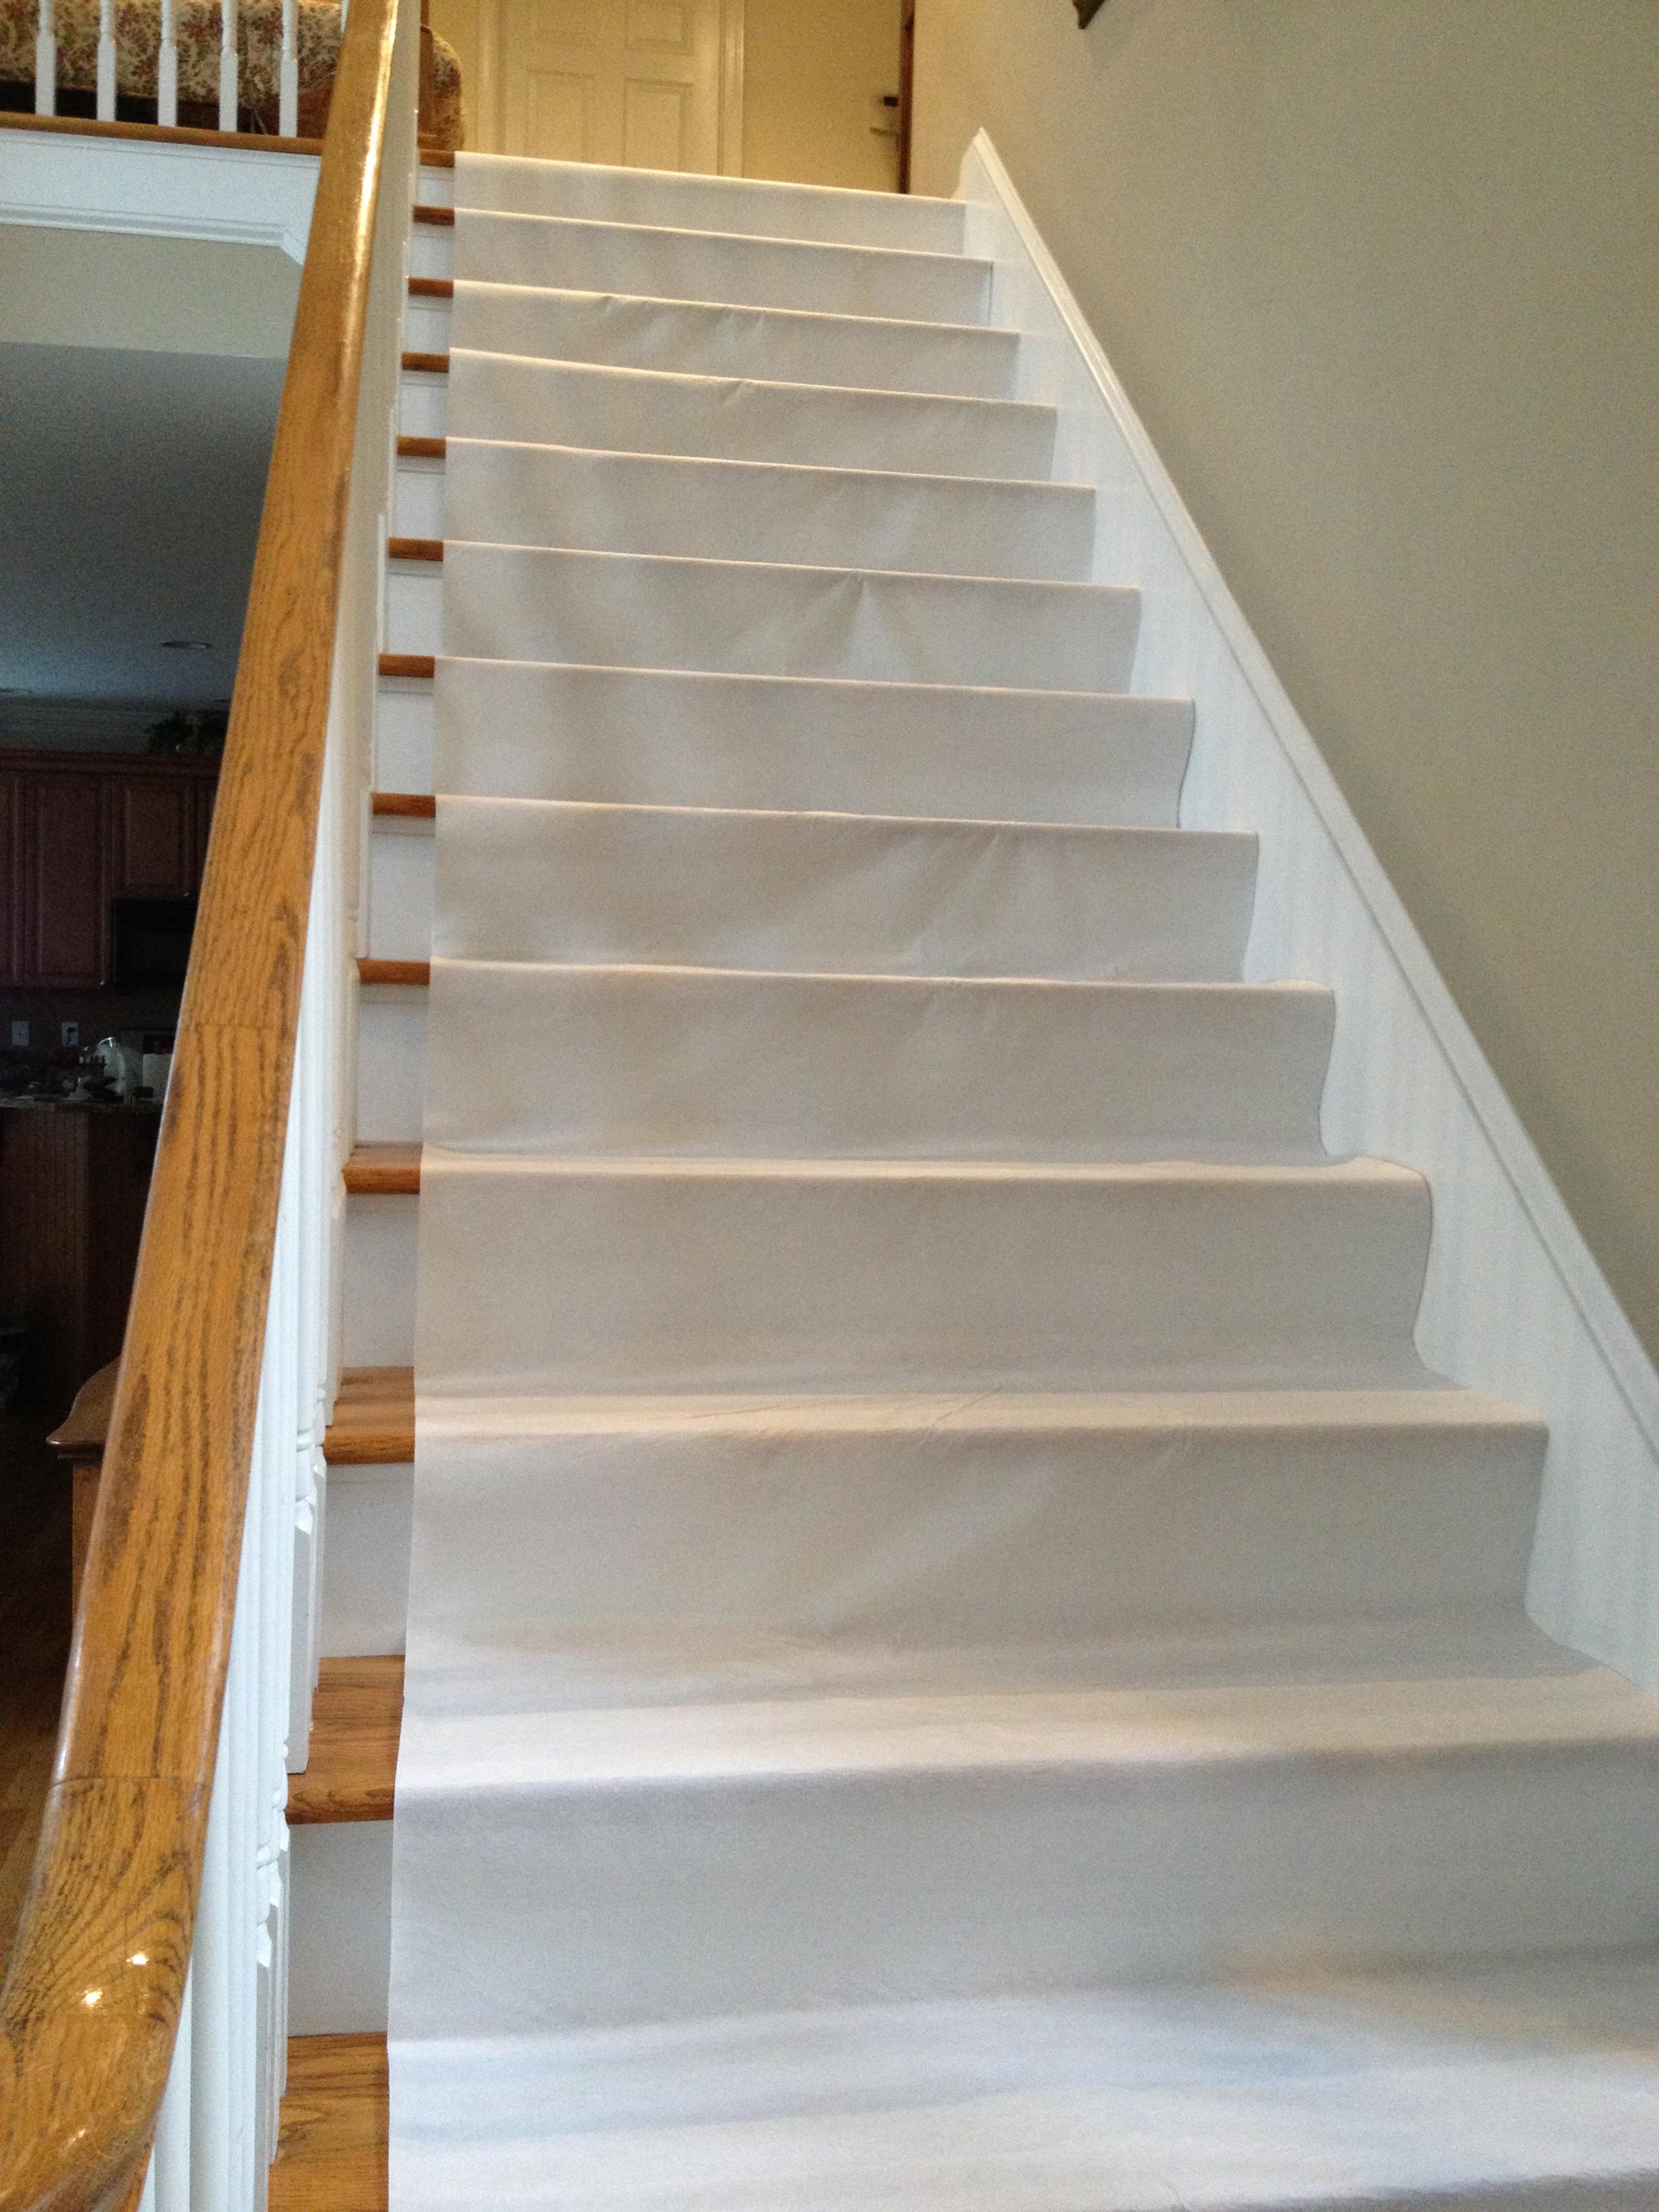 Jobsite protection floor wall protection ccp pro for Ccp flooring